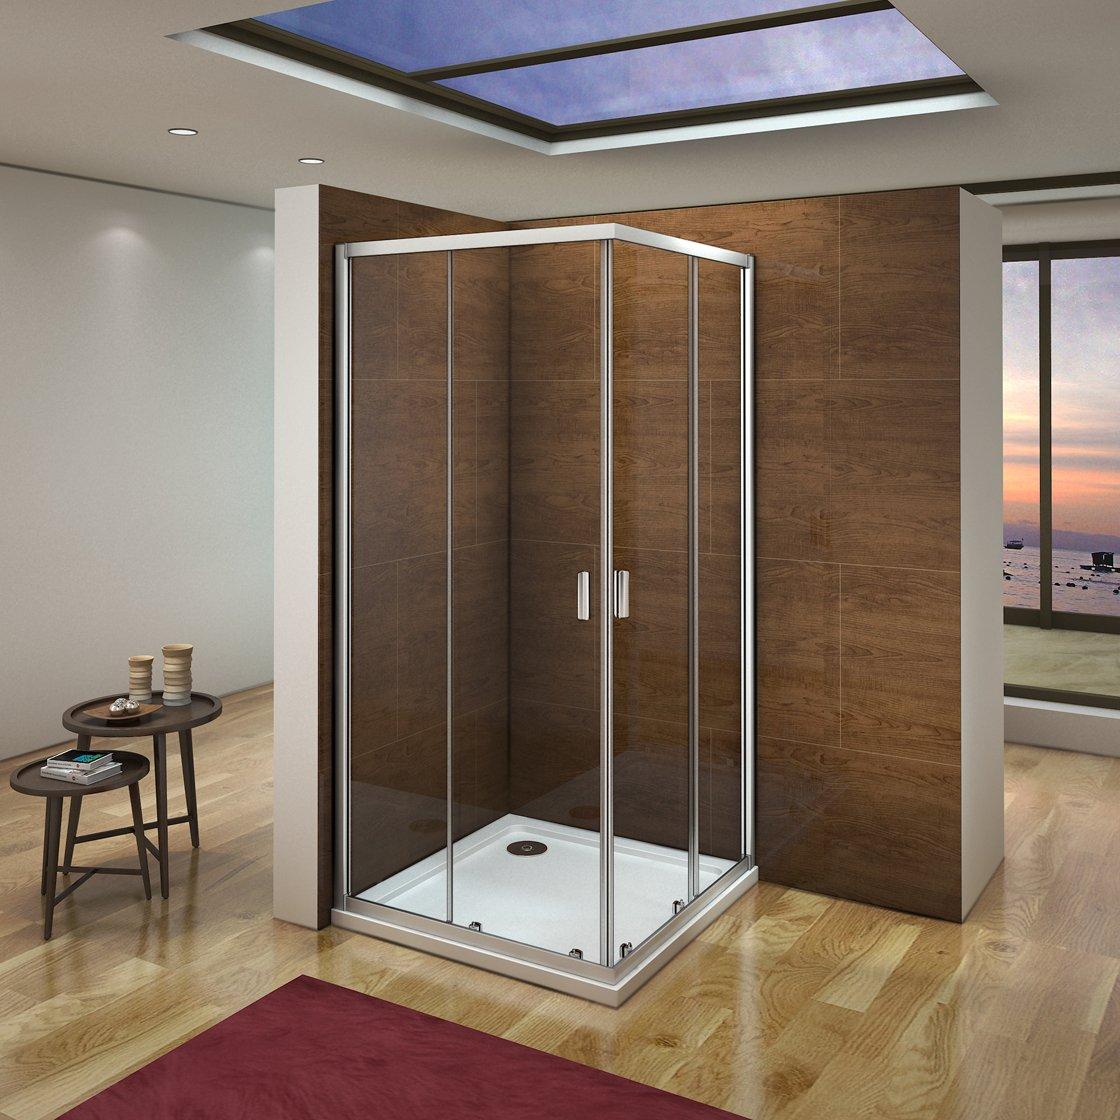 Cabina de ducha mampara de ducha corredera puerta 6mm Easyclean cristal Aica 80x80cm Aica Sanitaer